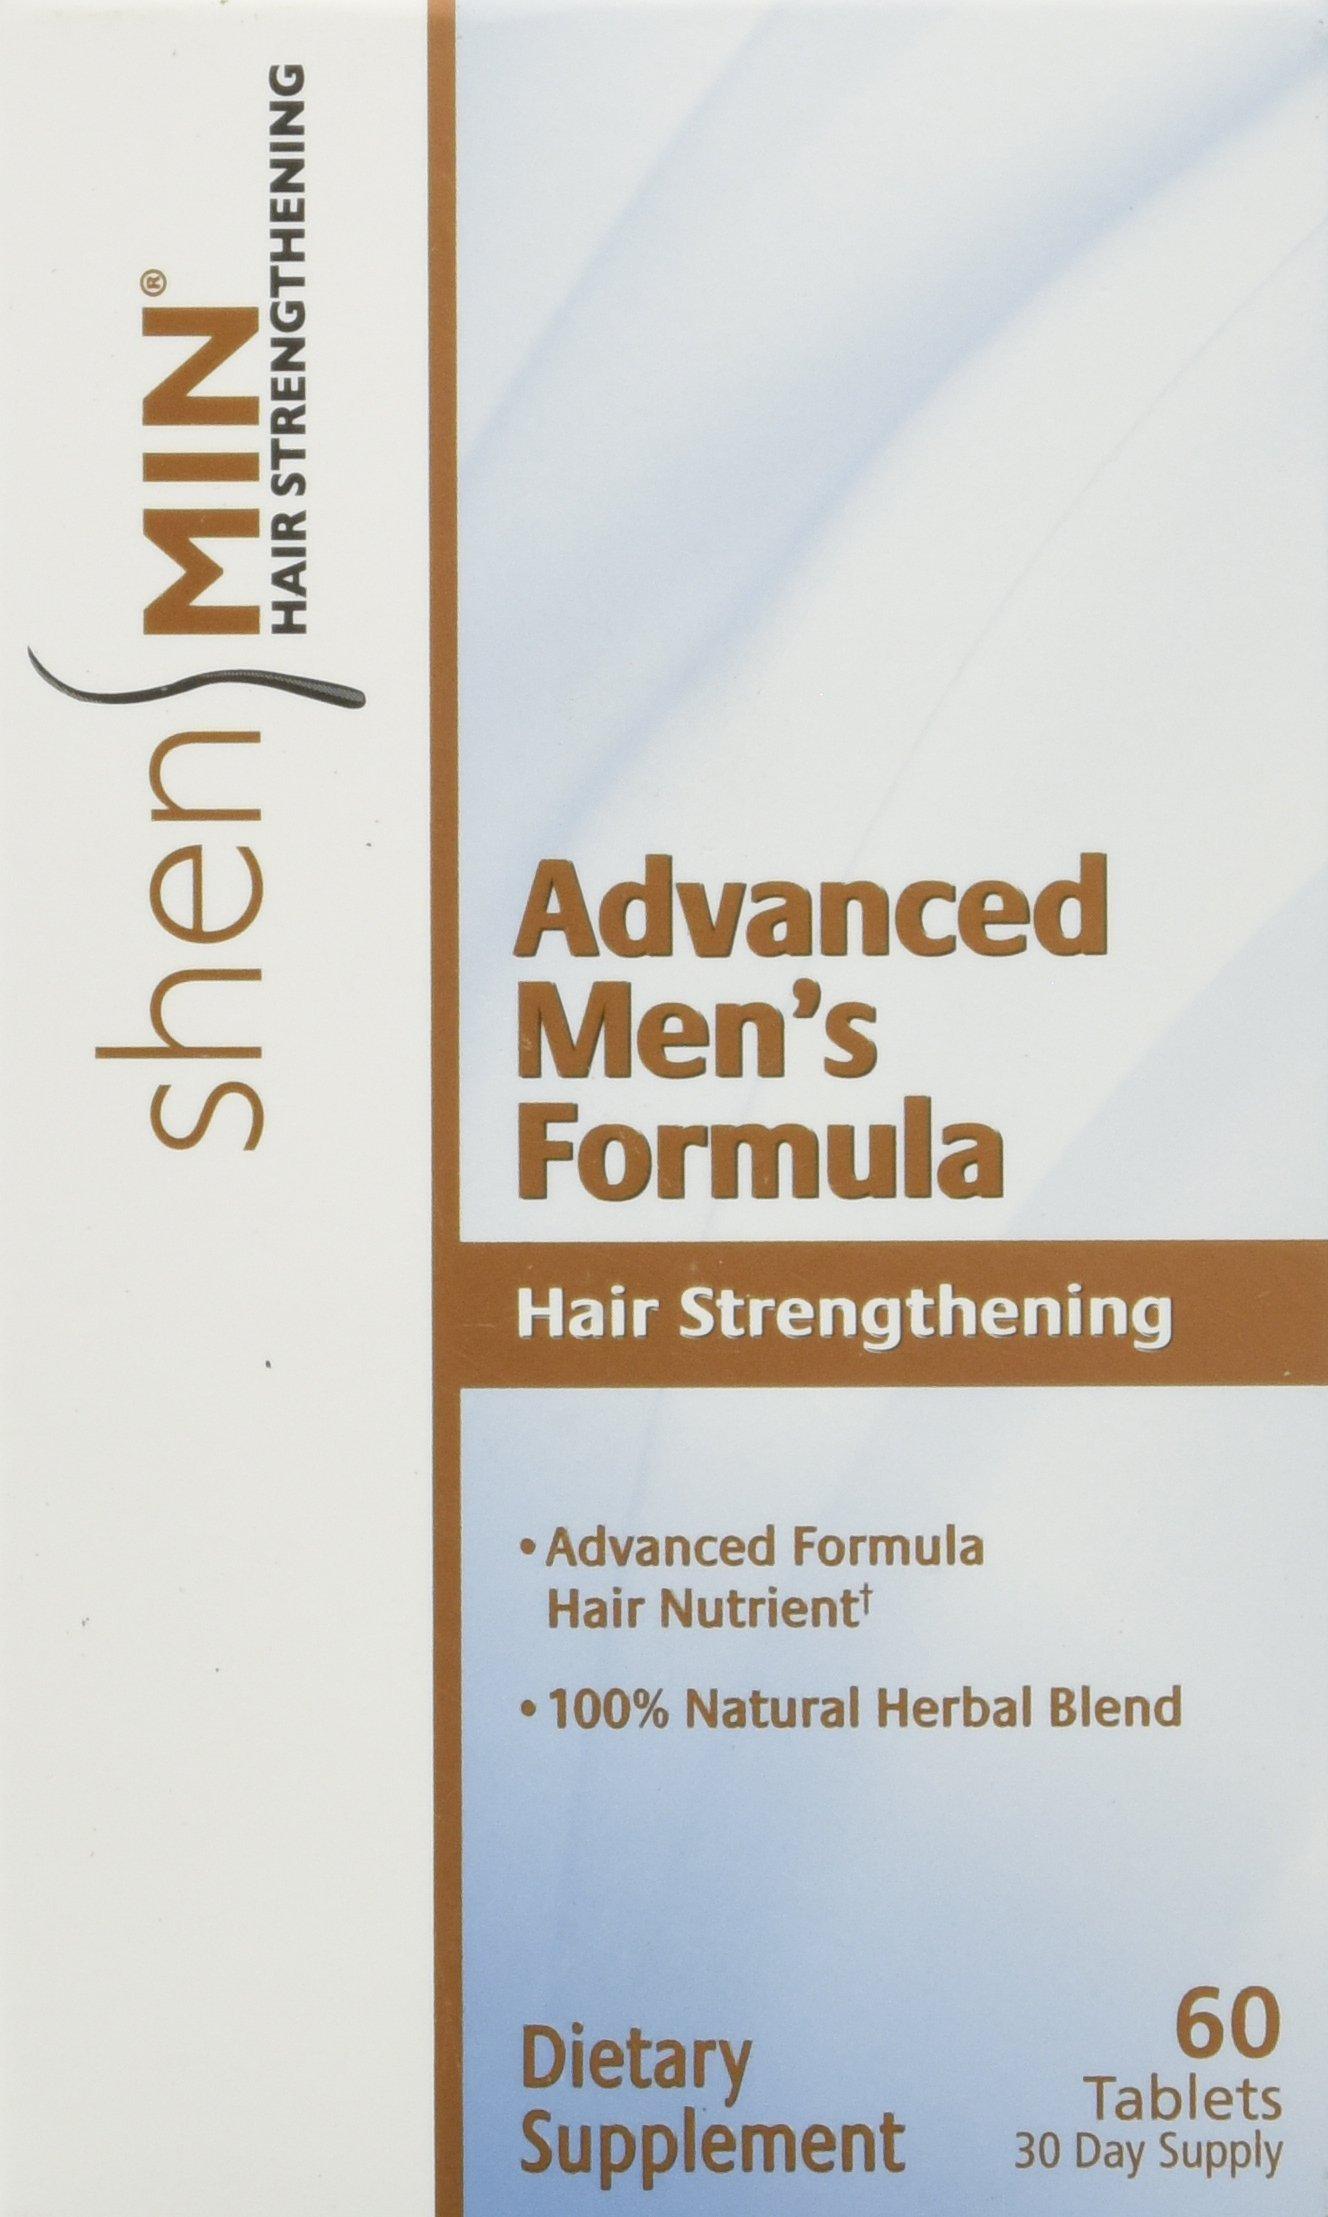 Shen Min Hair Strengthening Advanced Men's Formula Tablets, 60 Count